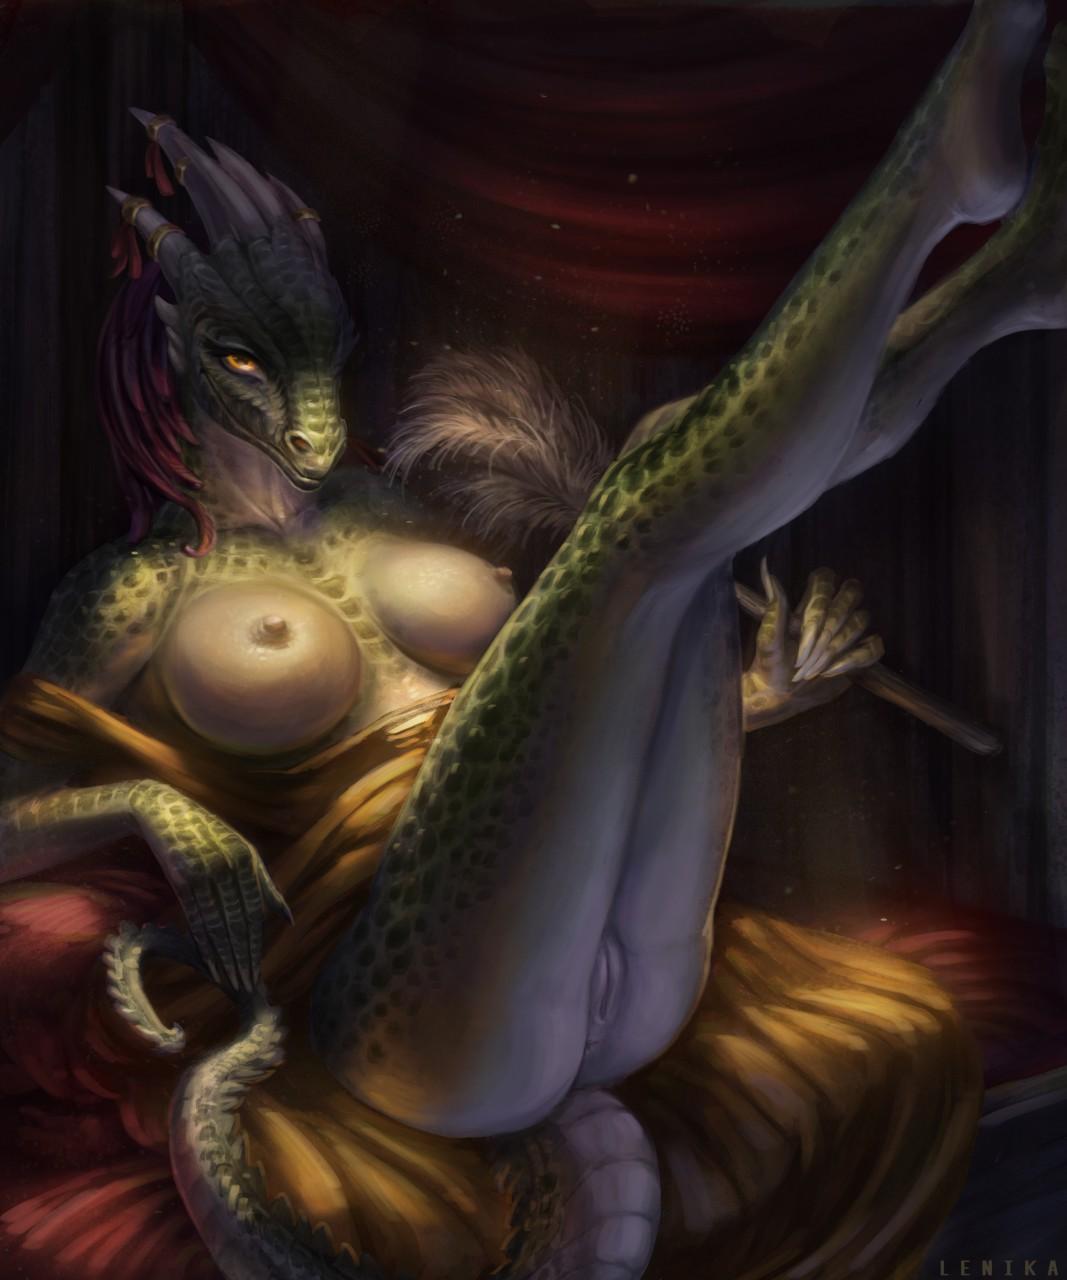 argonian lusty skyrim maid porn Meikoku gakuen jutai hen cg